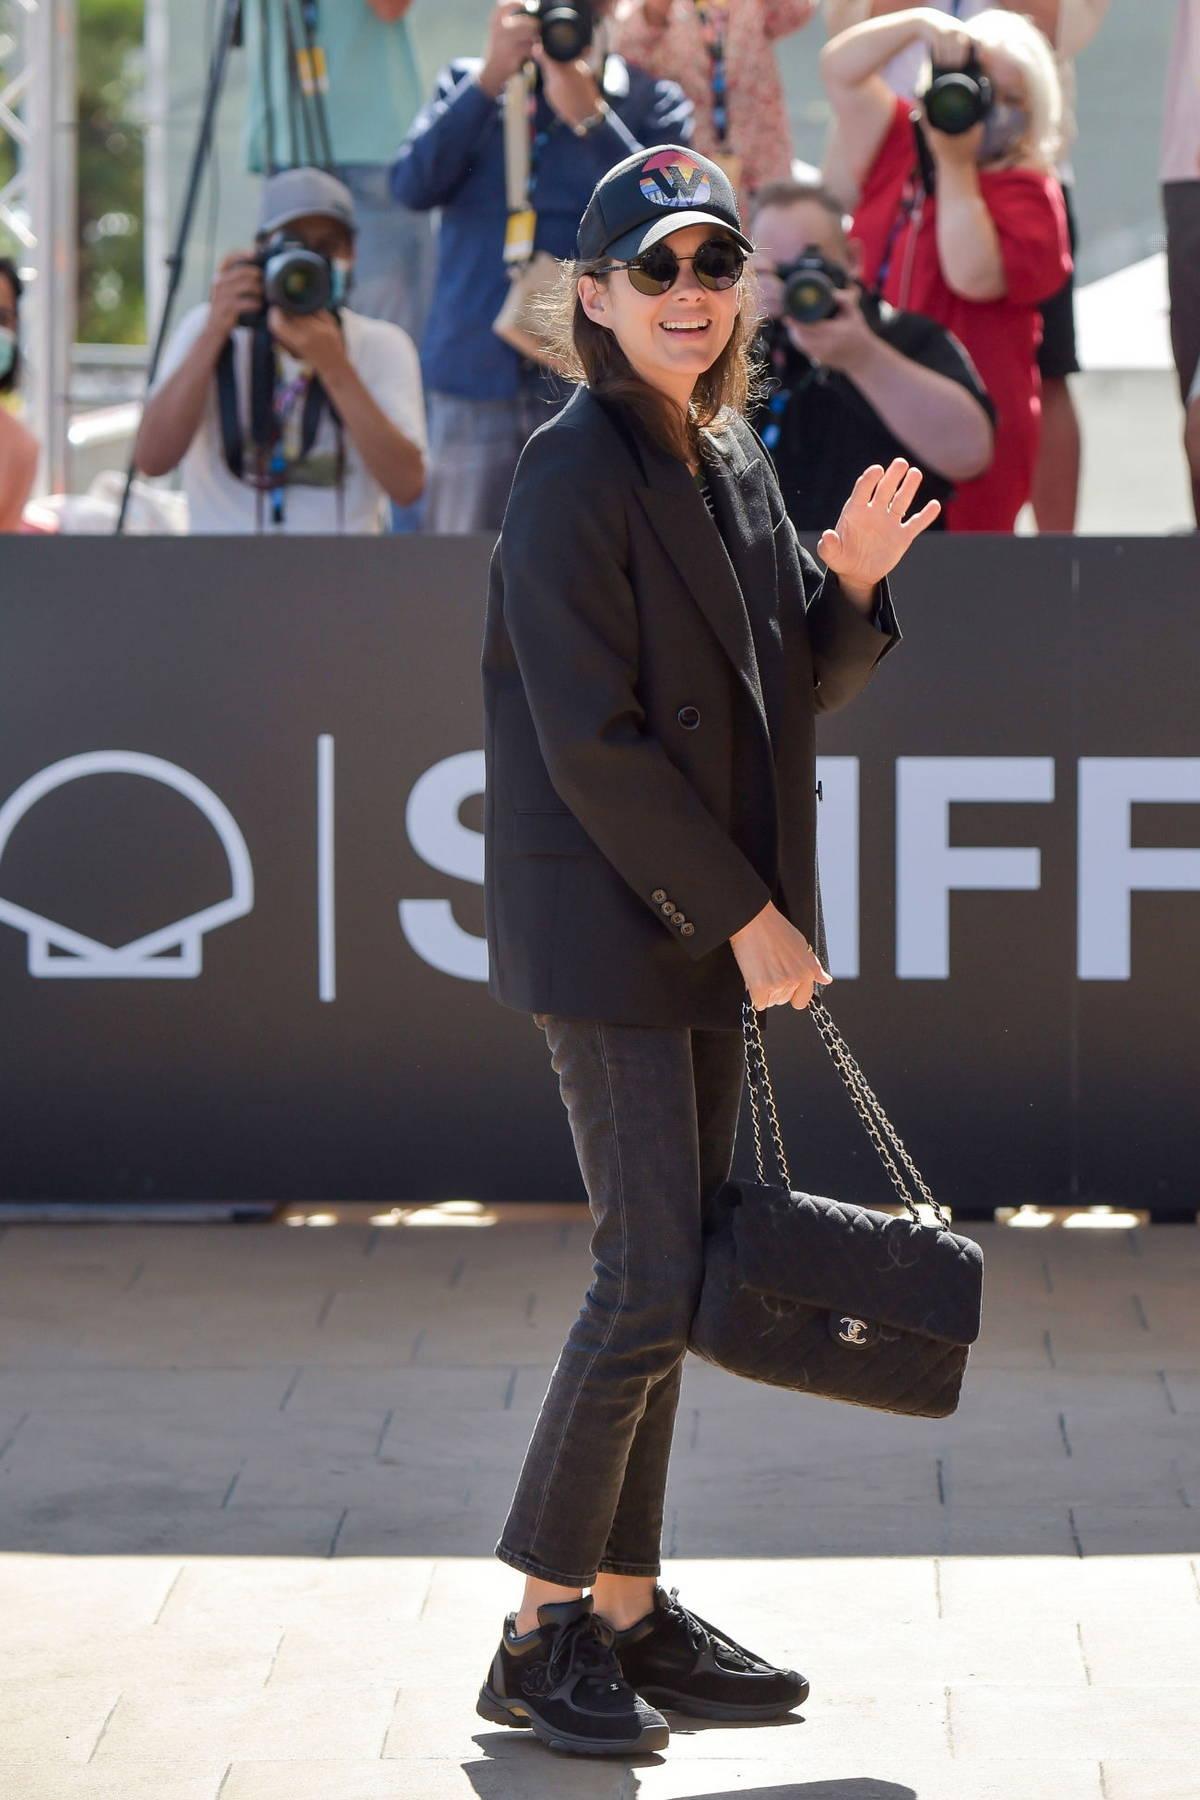 Marion Cotillard arrives at the Maria Cristina Hotel during the 69th San Sebastian International Film Festival in San Sebastian, Spain